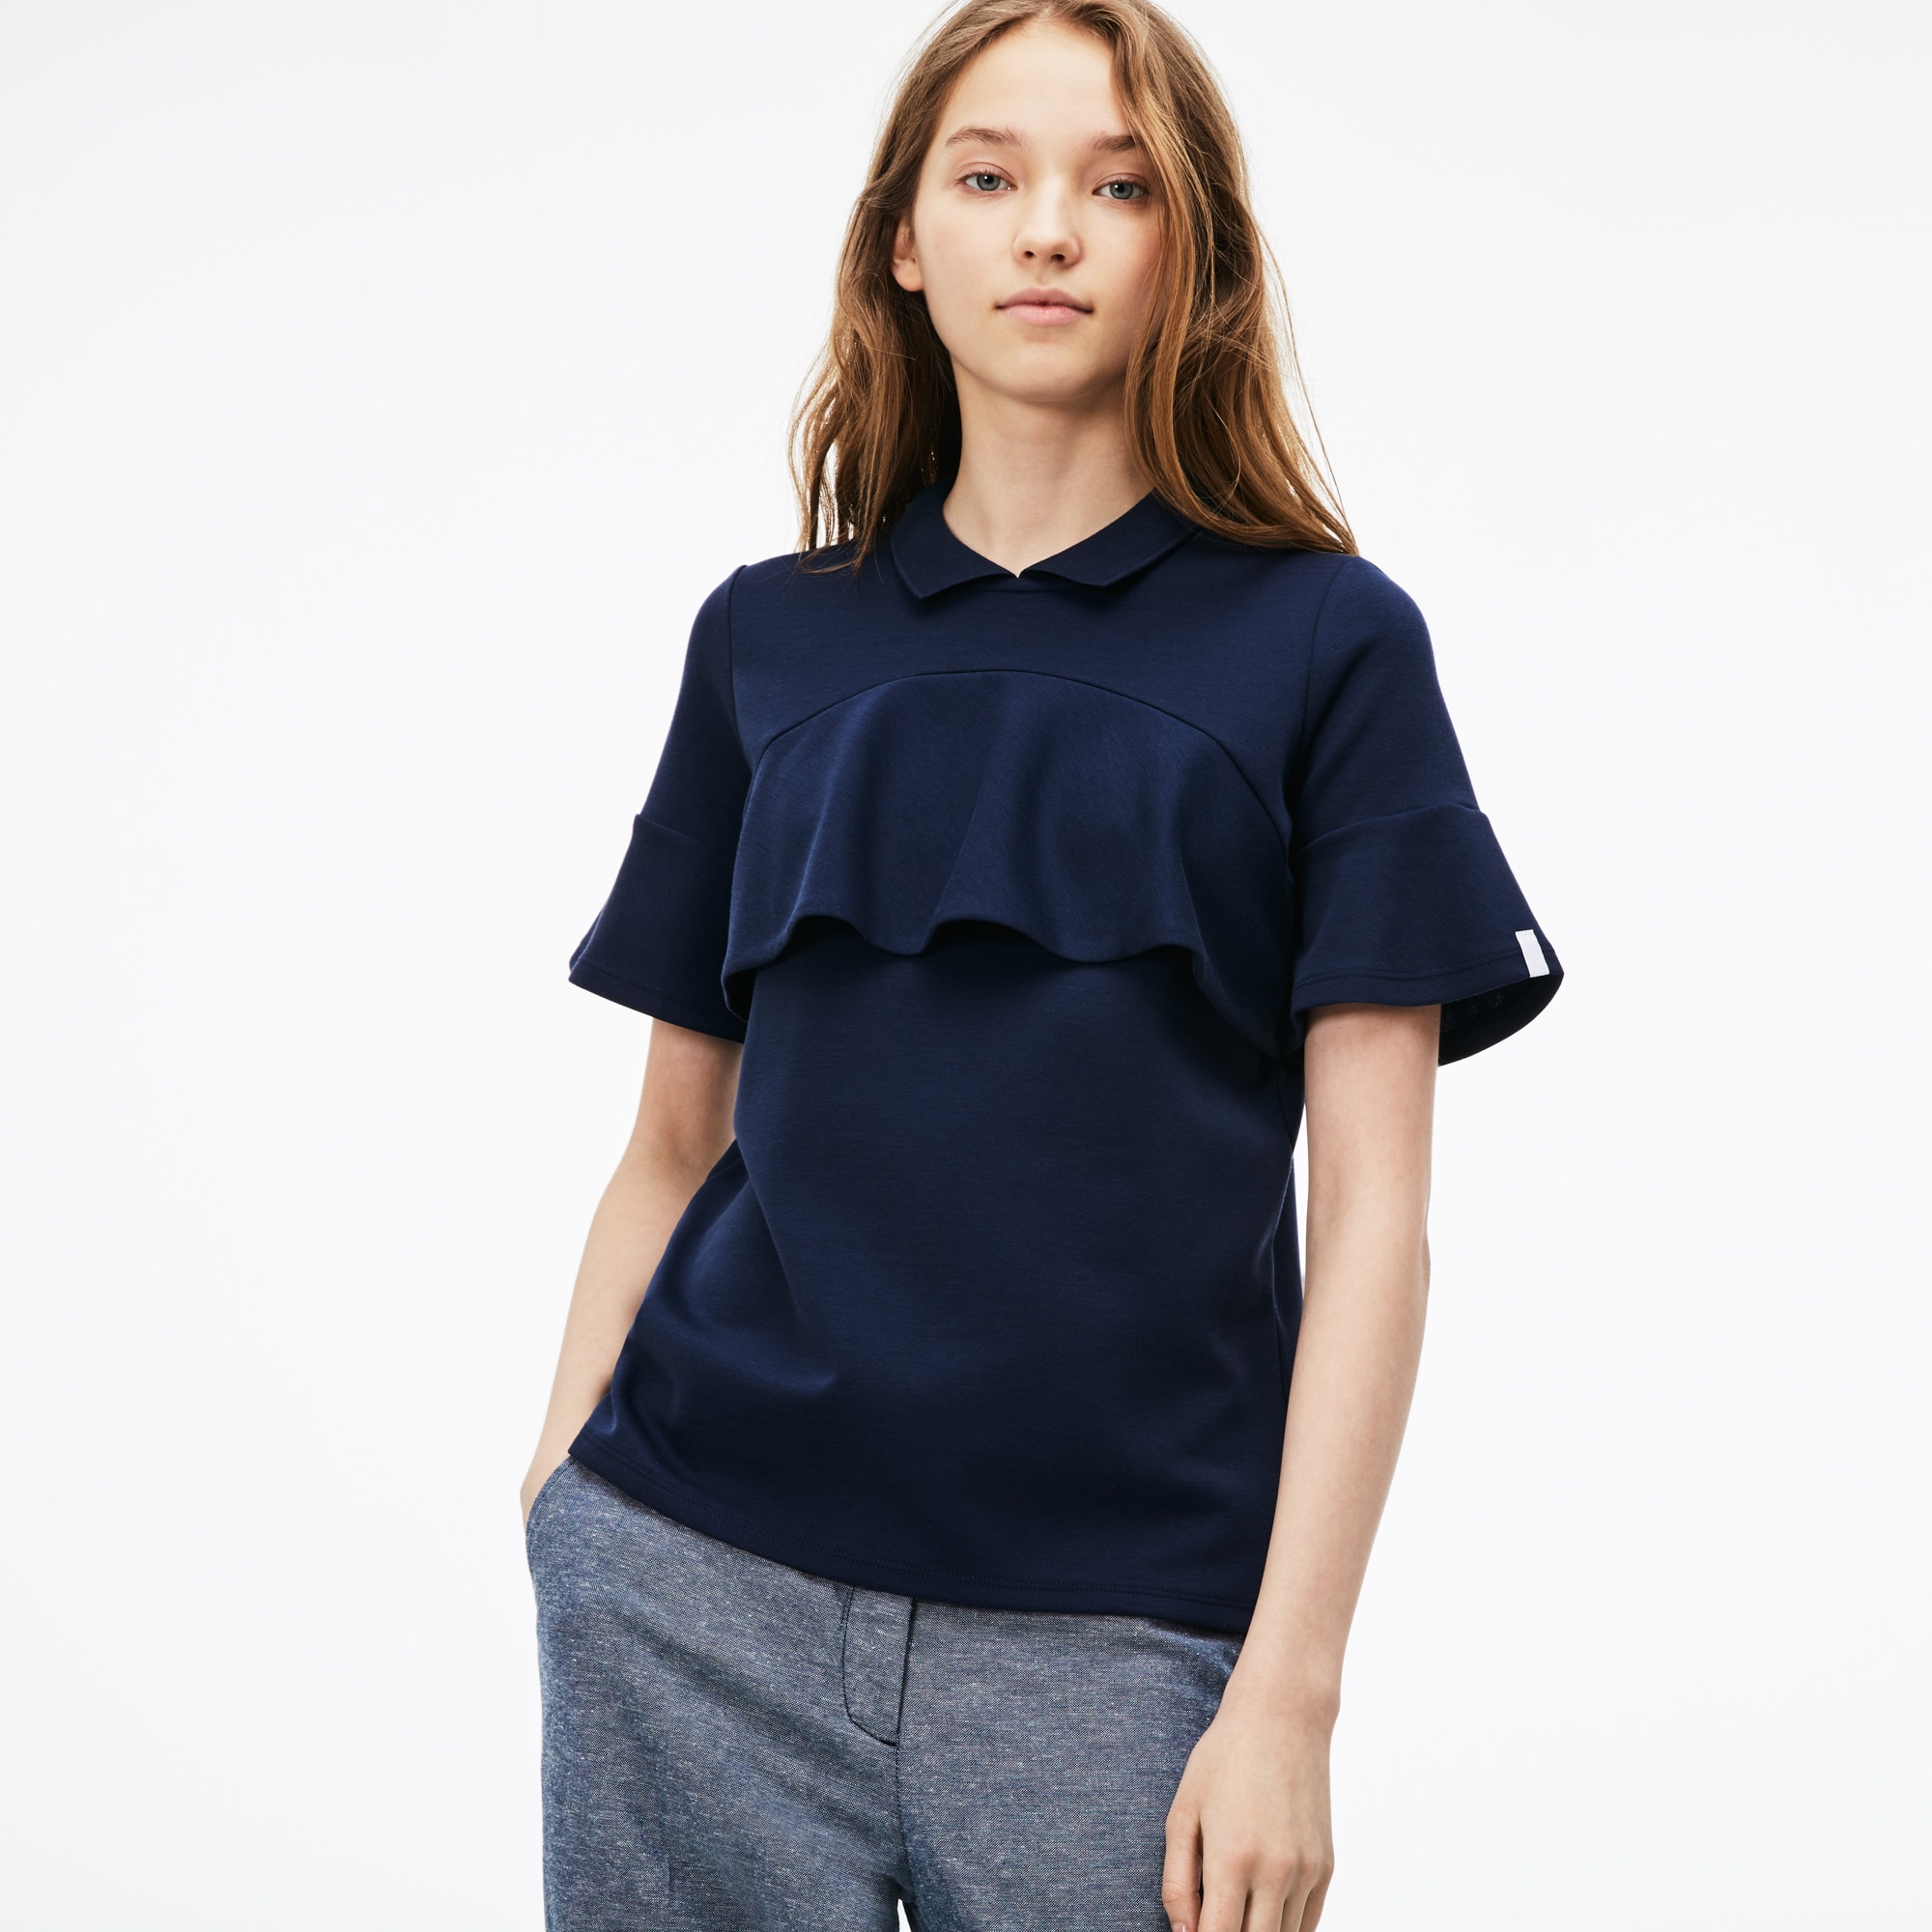 Lockeres Damen-Poloshirt aus Jersey mit Volants LACOSTE L!VE